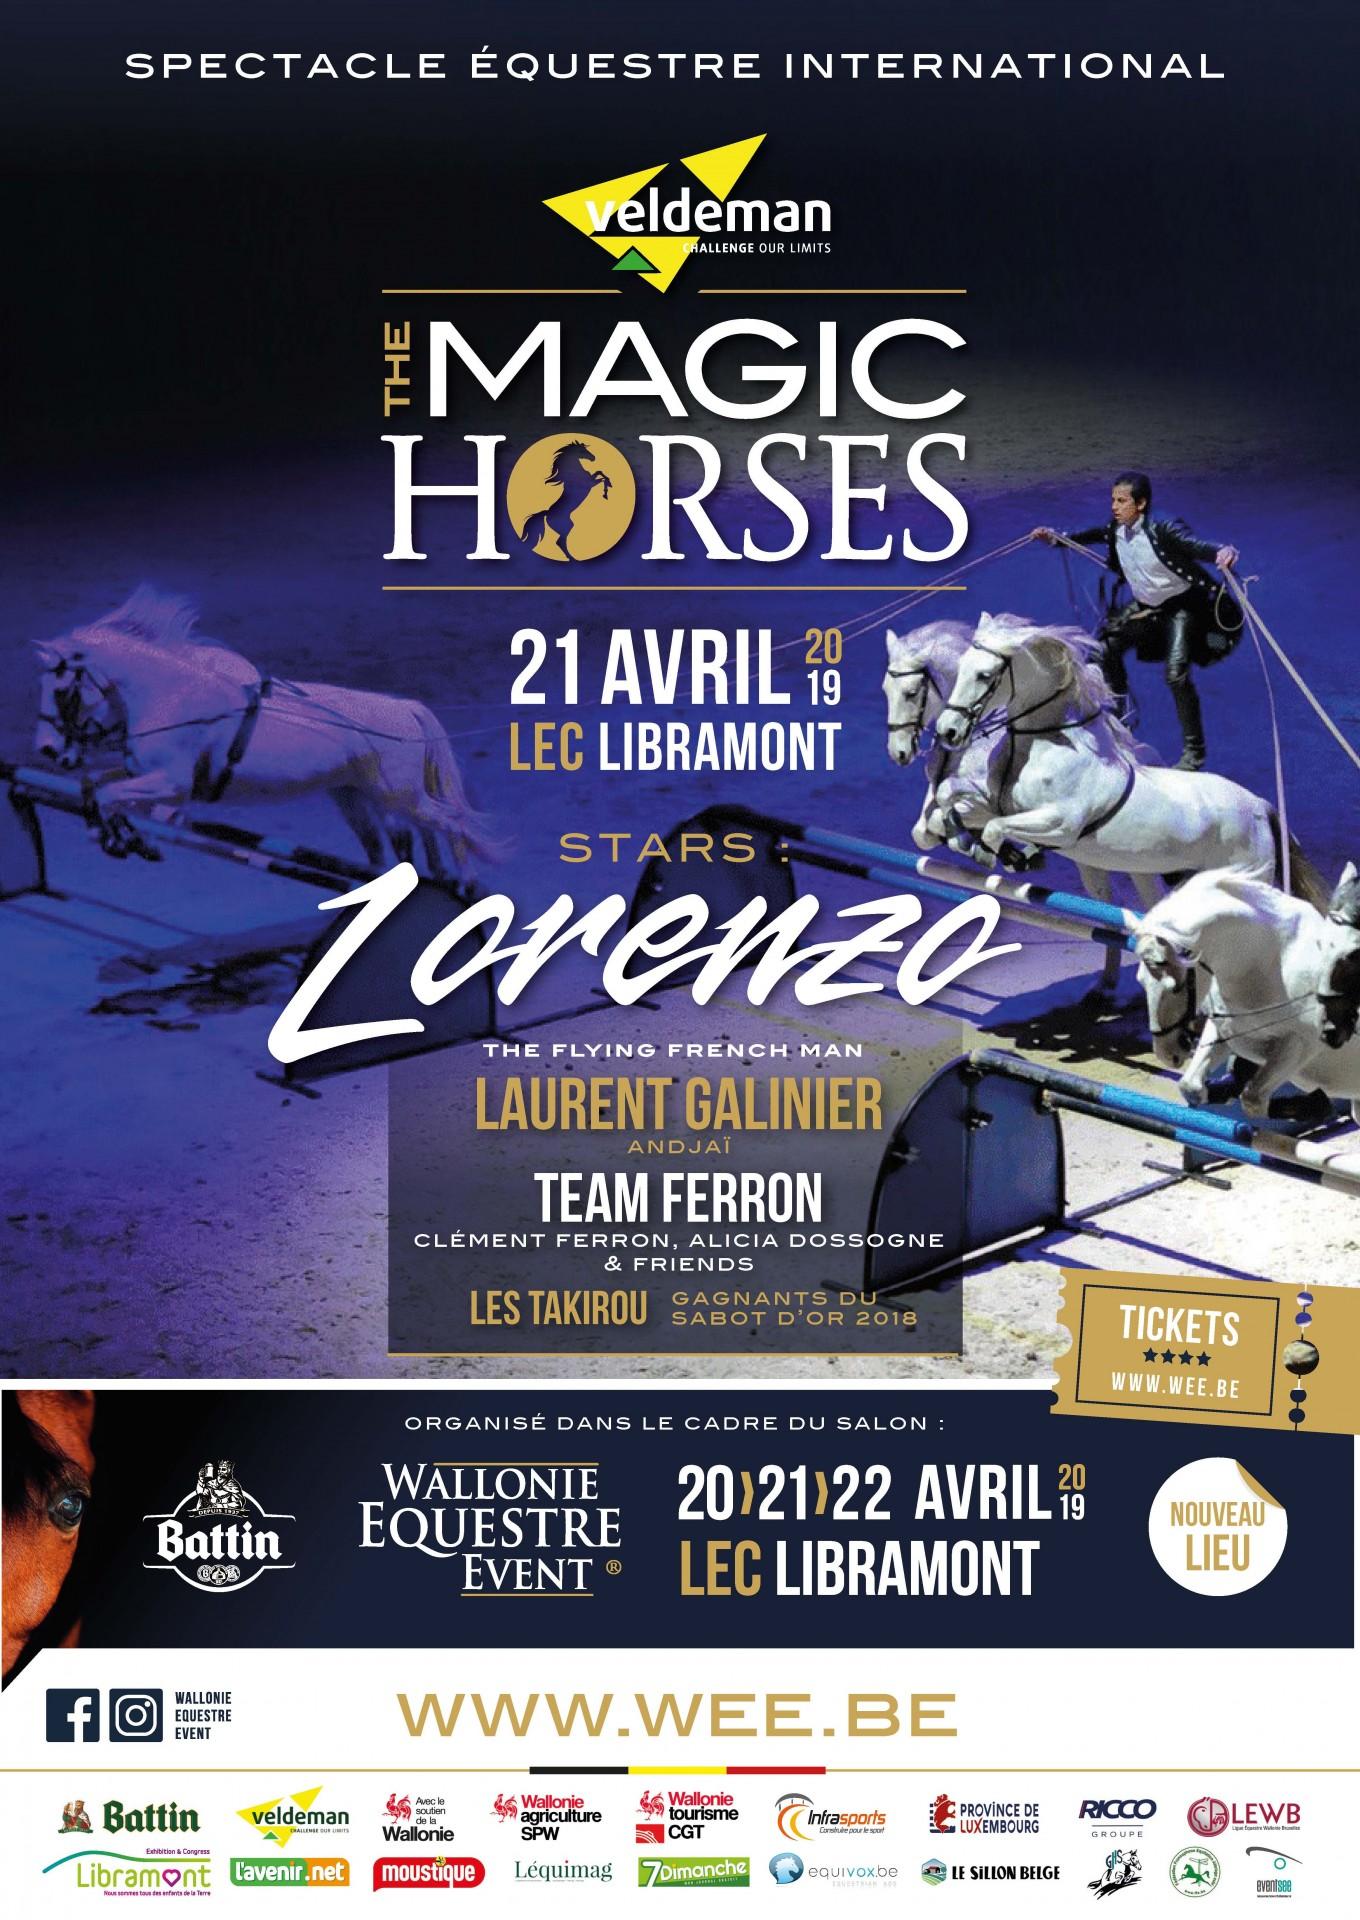 Wallonie Equestre Event 2019